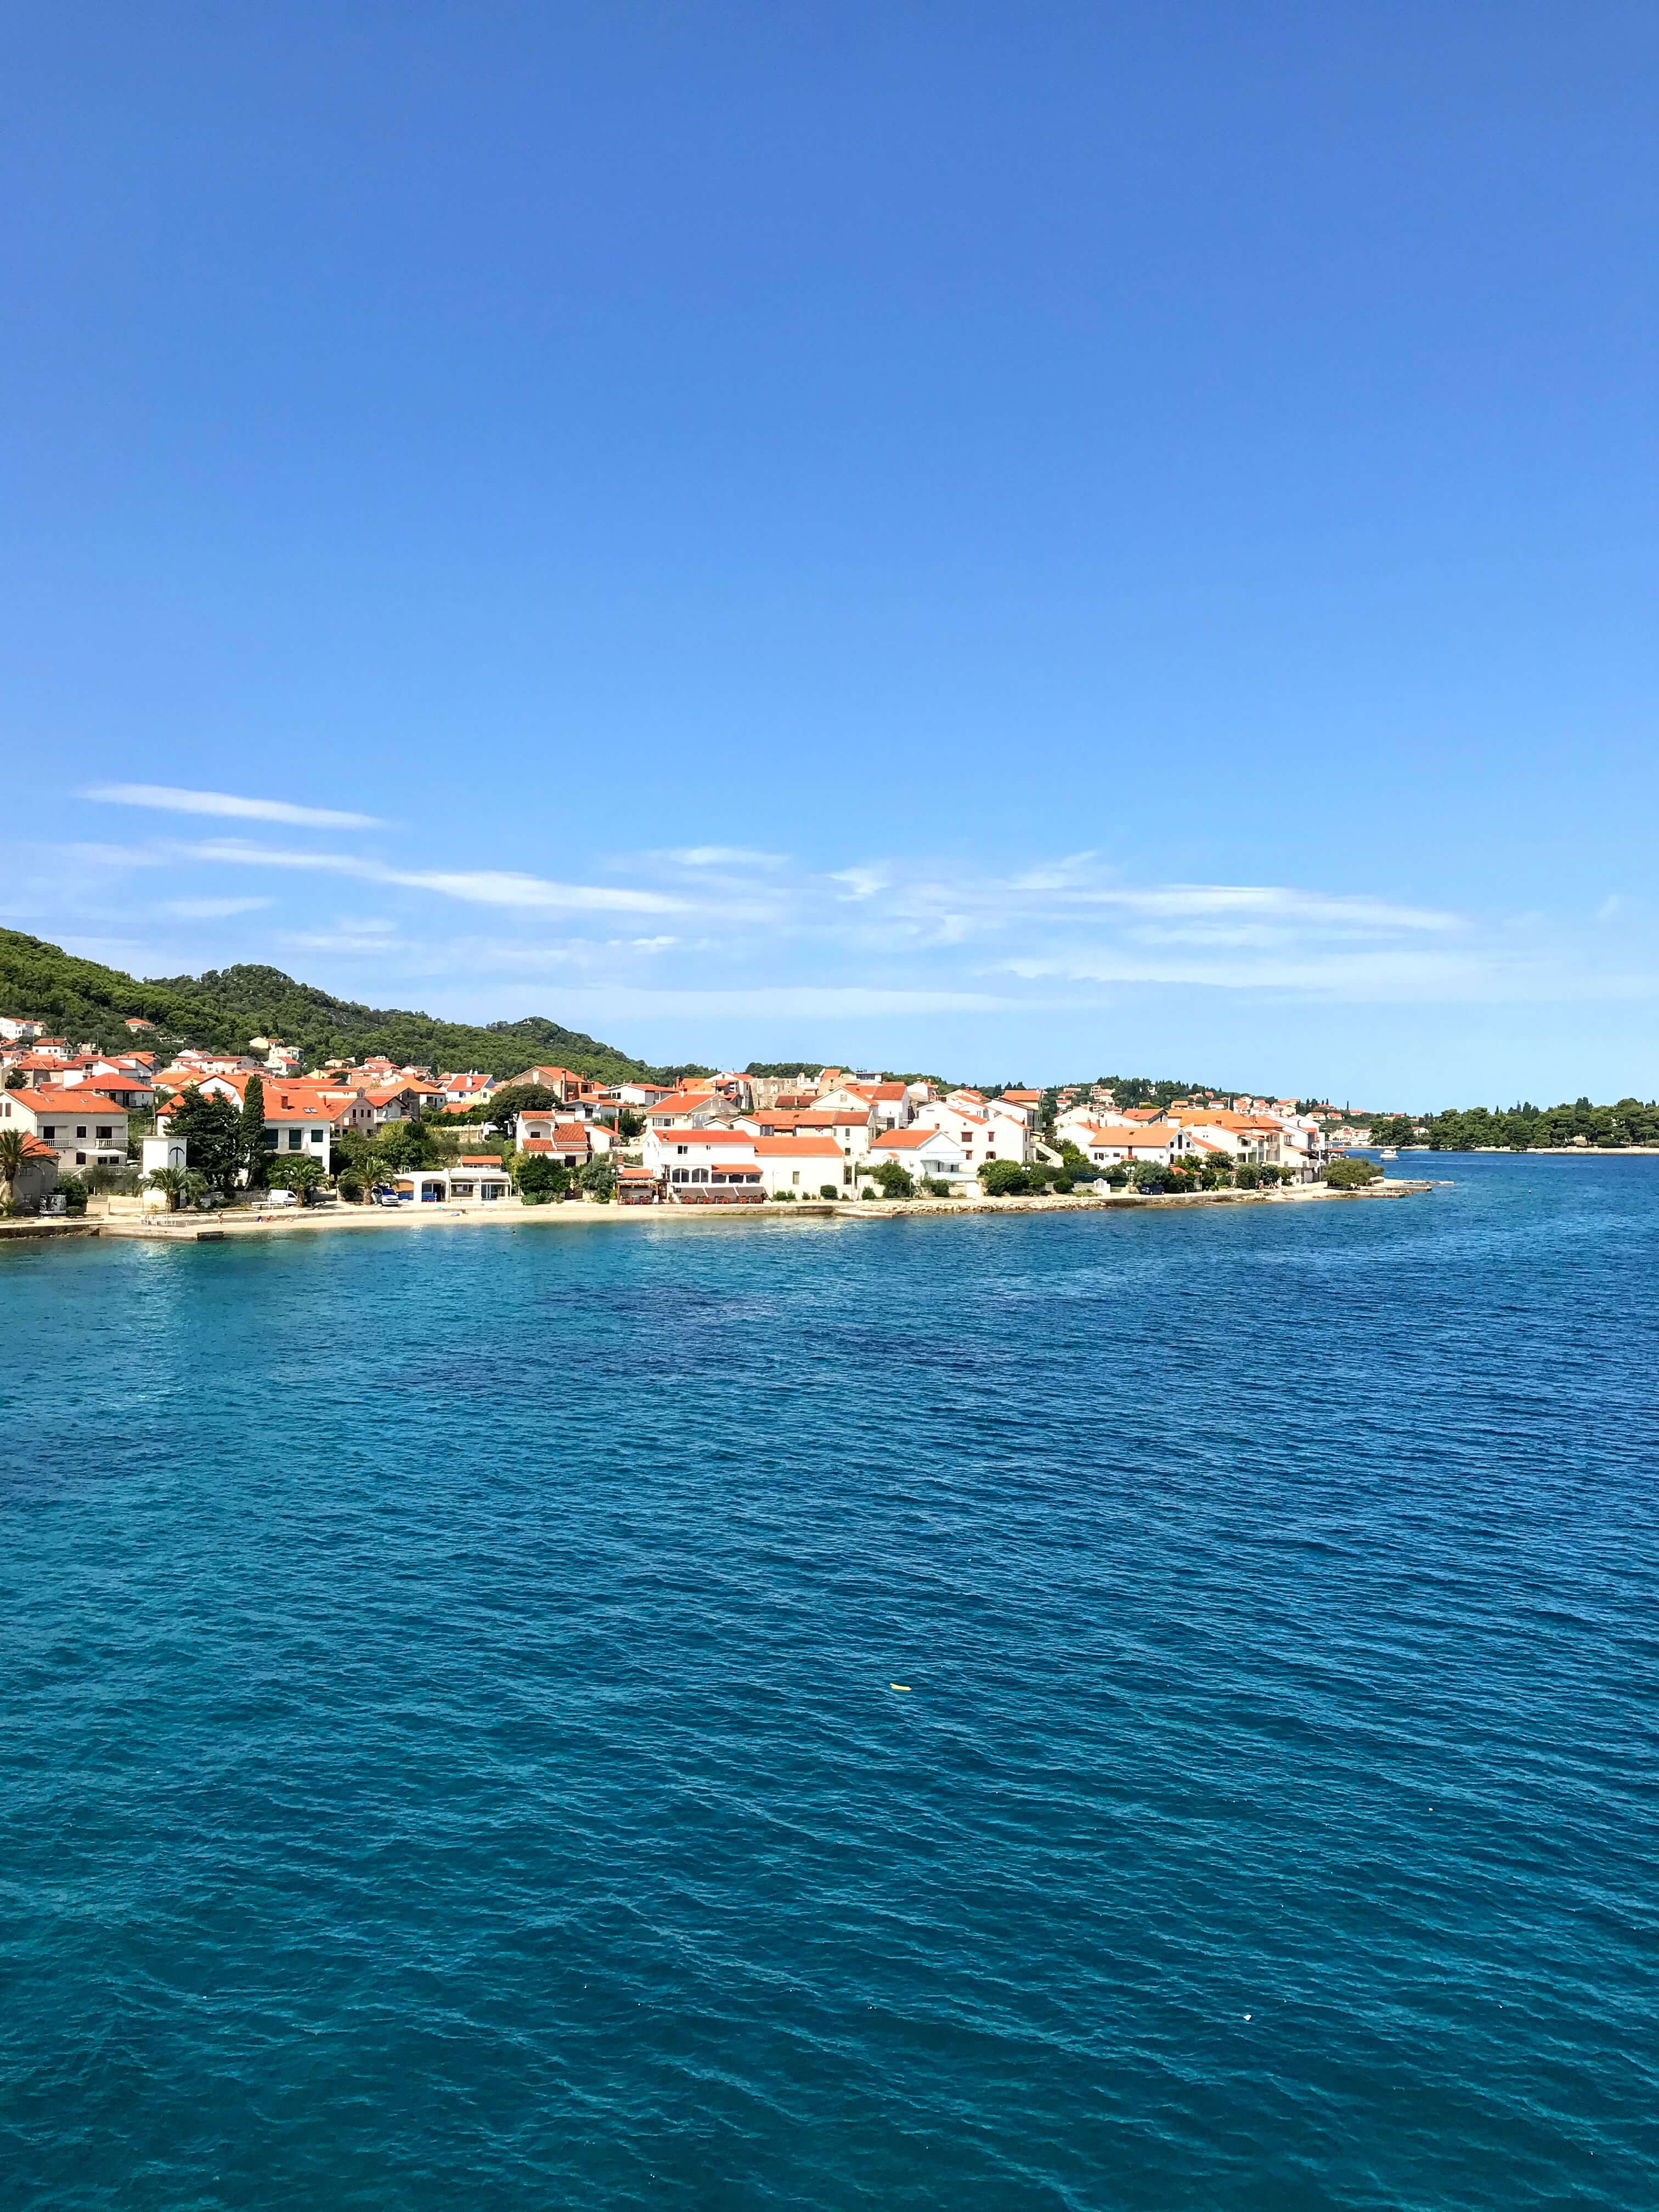 view of Preko on our ferry from Zadar to Ugljan, Croatia